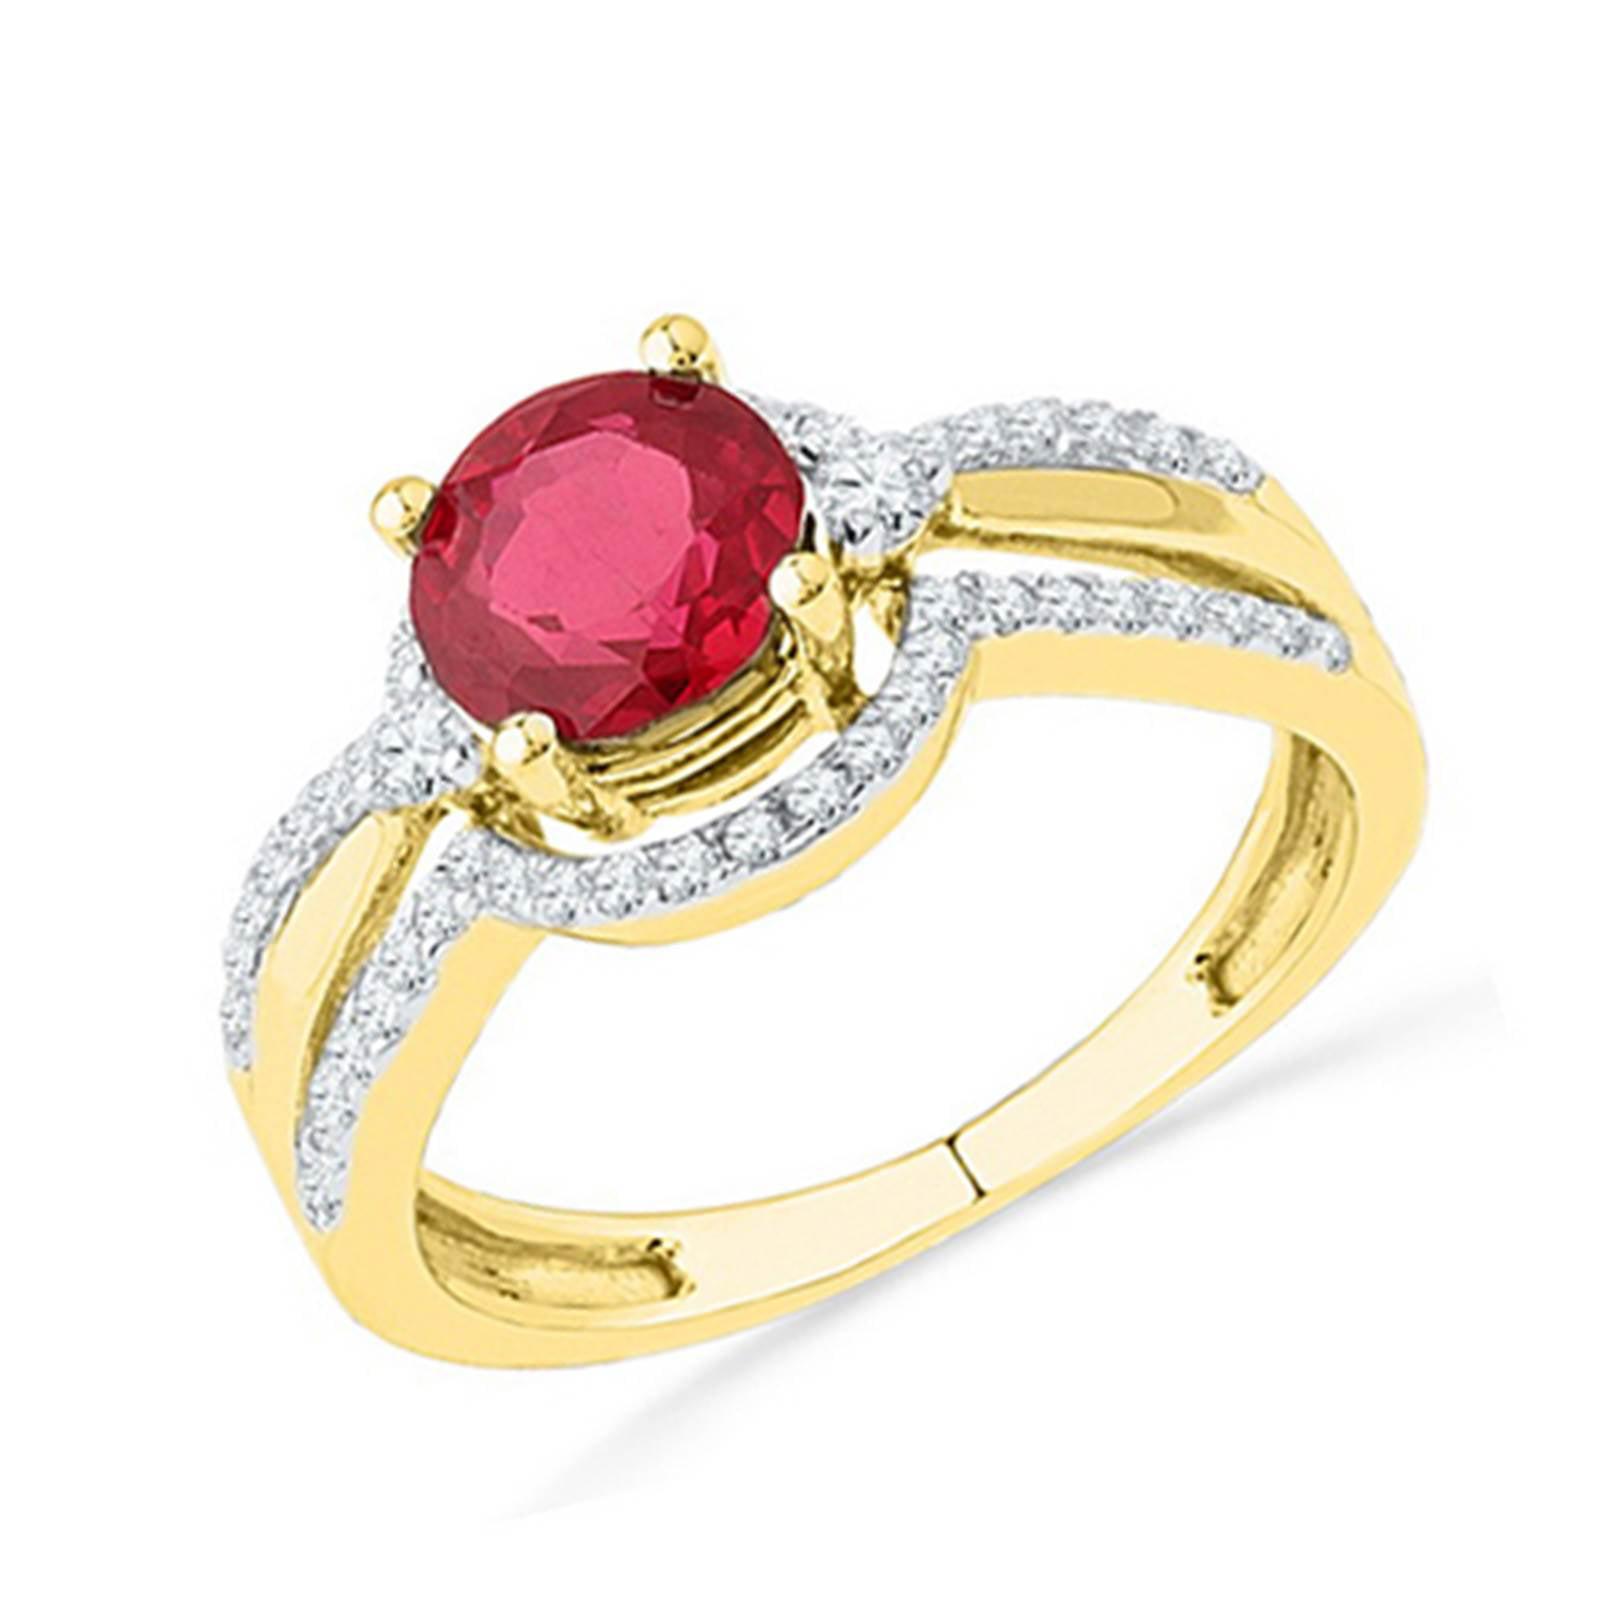 10k Yellow Gold Diamond & Created Ruby Fashion Bridal Ring 1.70CT